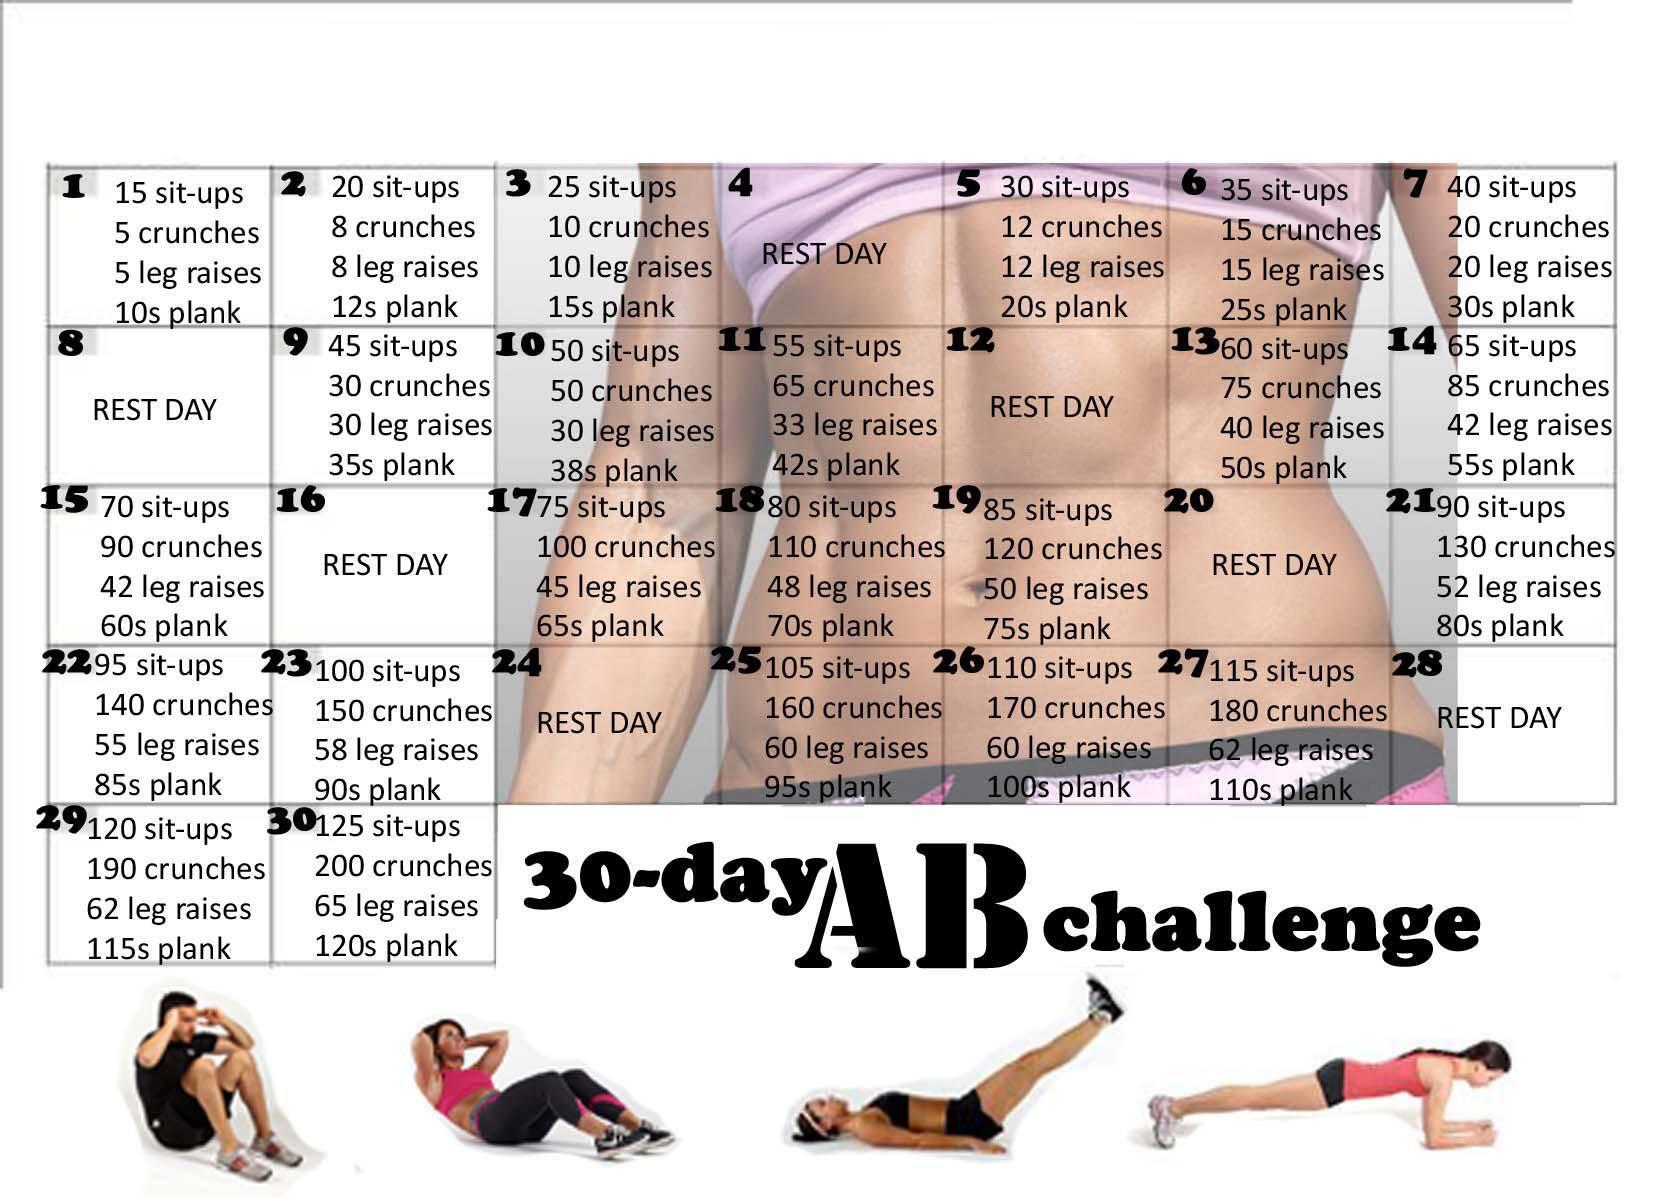 30 day Ab Challenge http://t.co/A1izQSGG6r